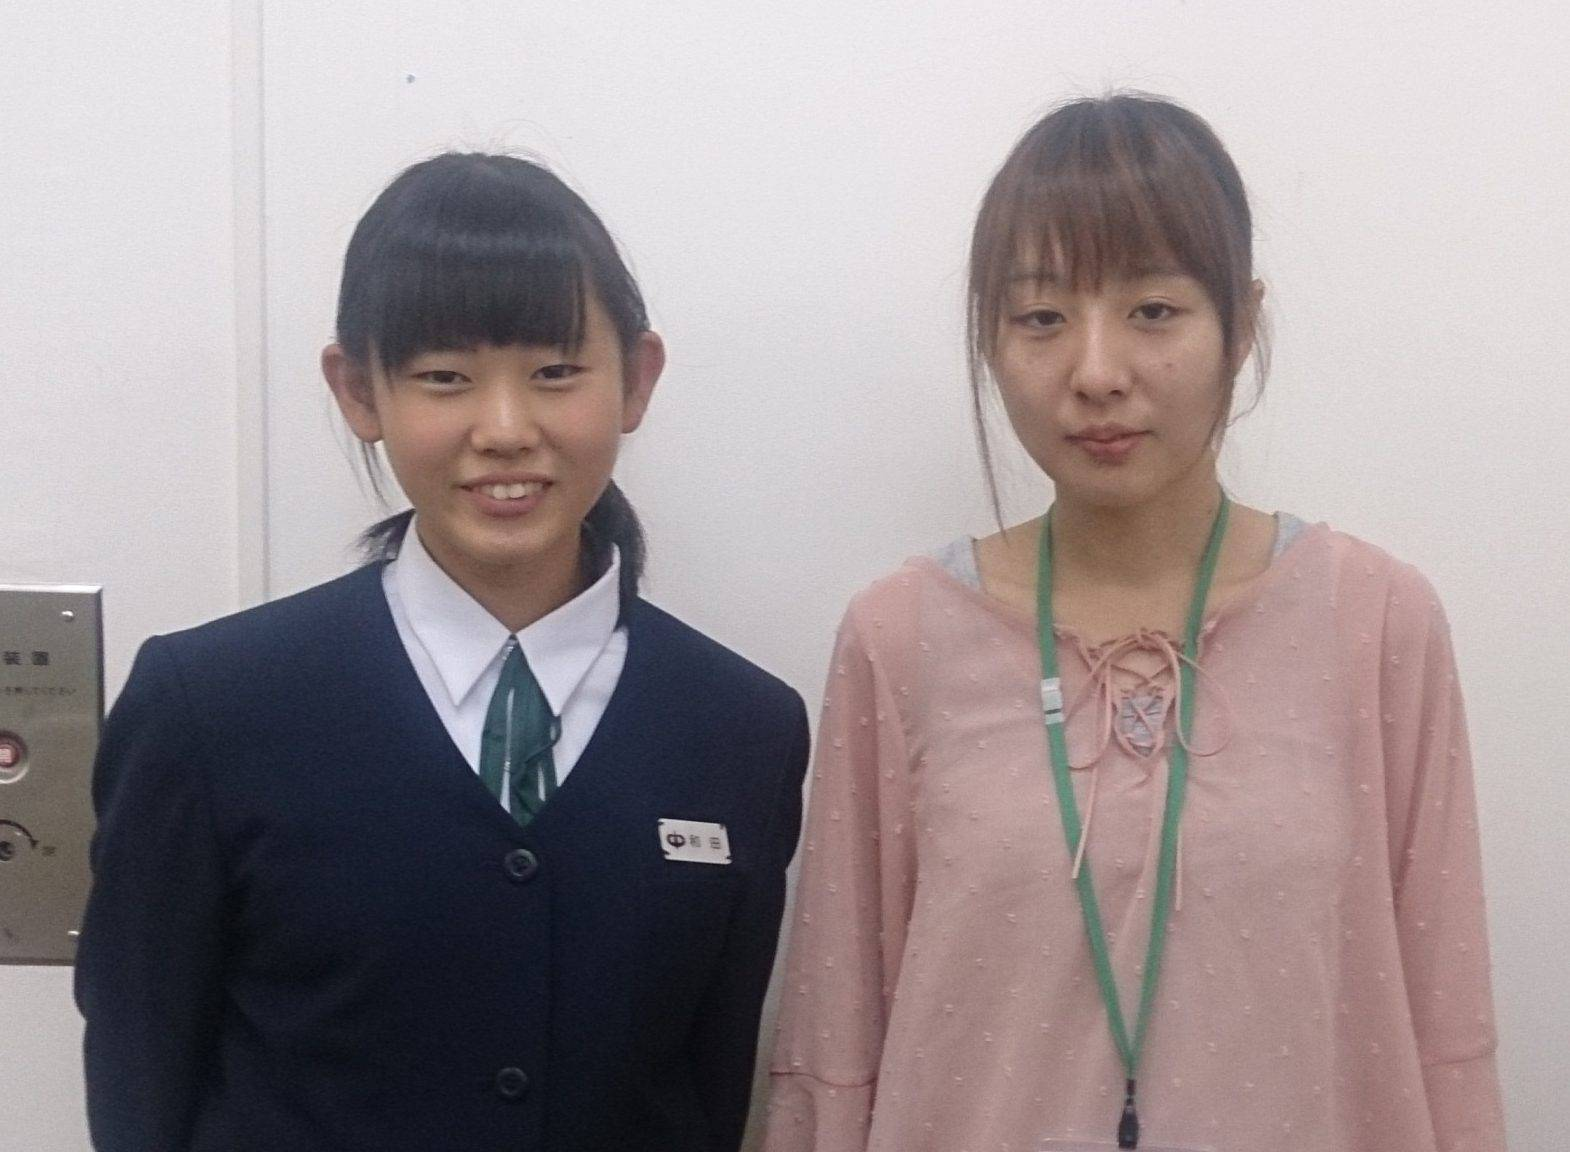 H29冬(成績はH29春) 中学3年 和田星乃さん 牧野先生